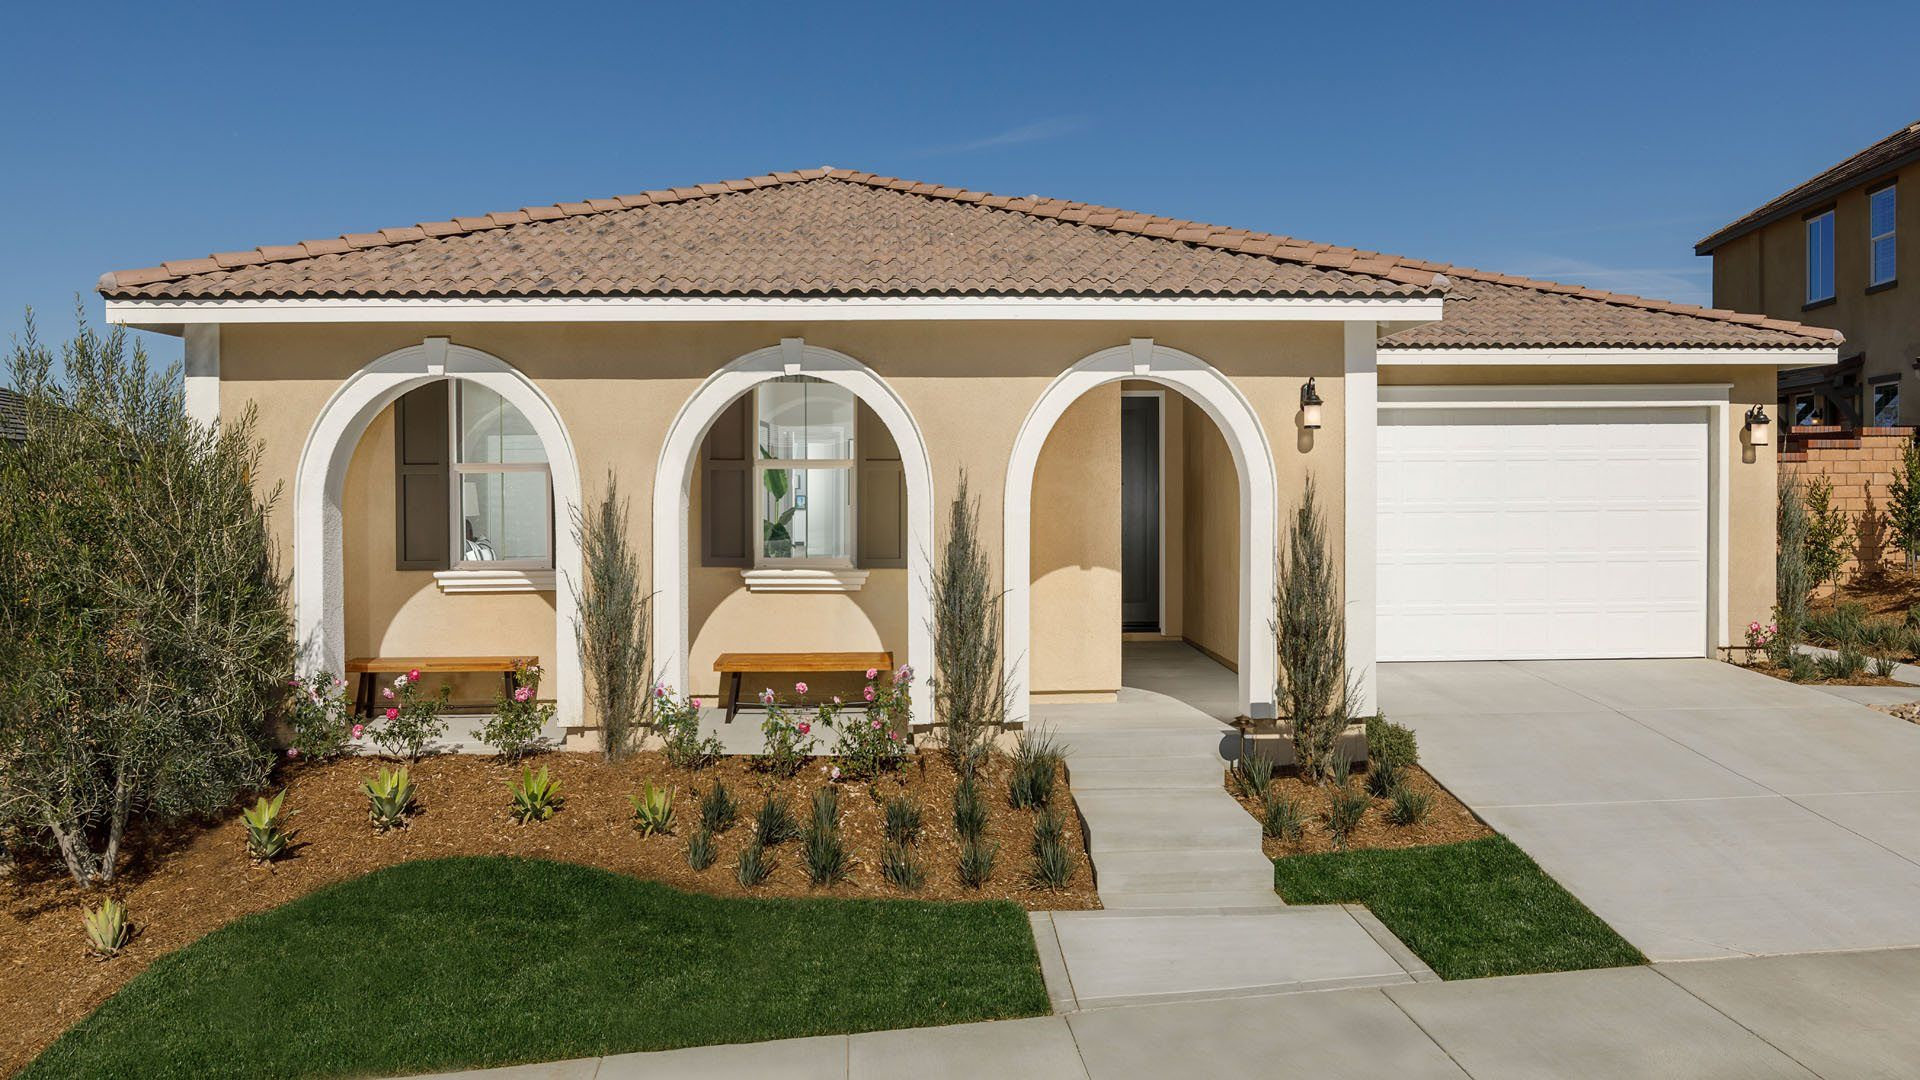 'Sierra Bella - Toccata' by Lennar - Inland Empire in Riverside-San Bernardino